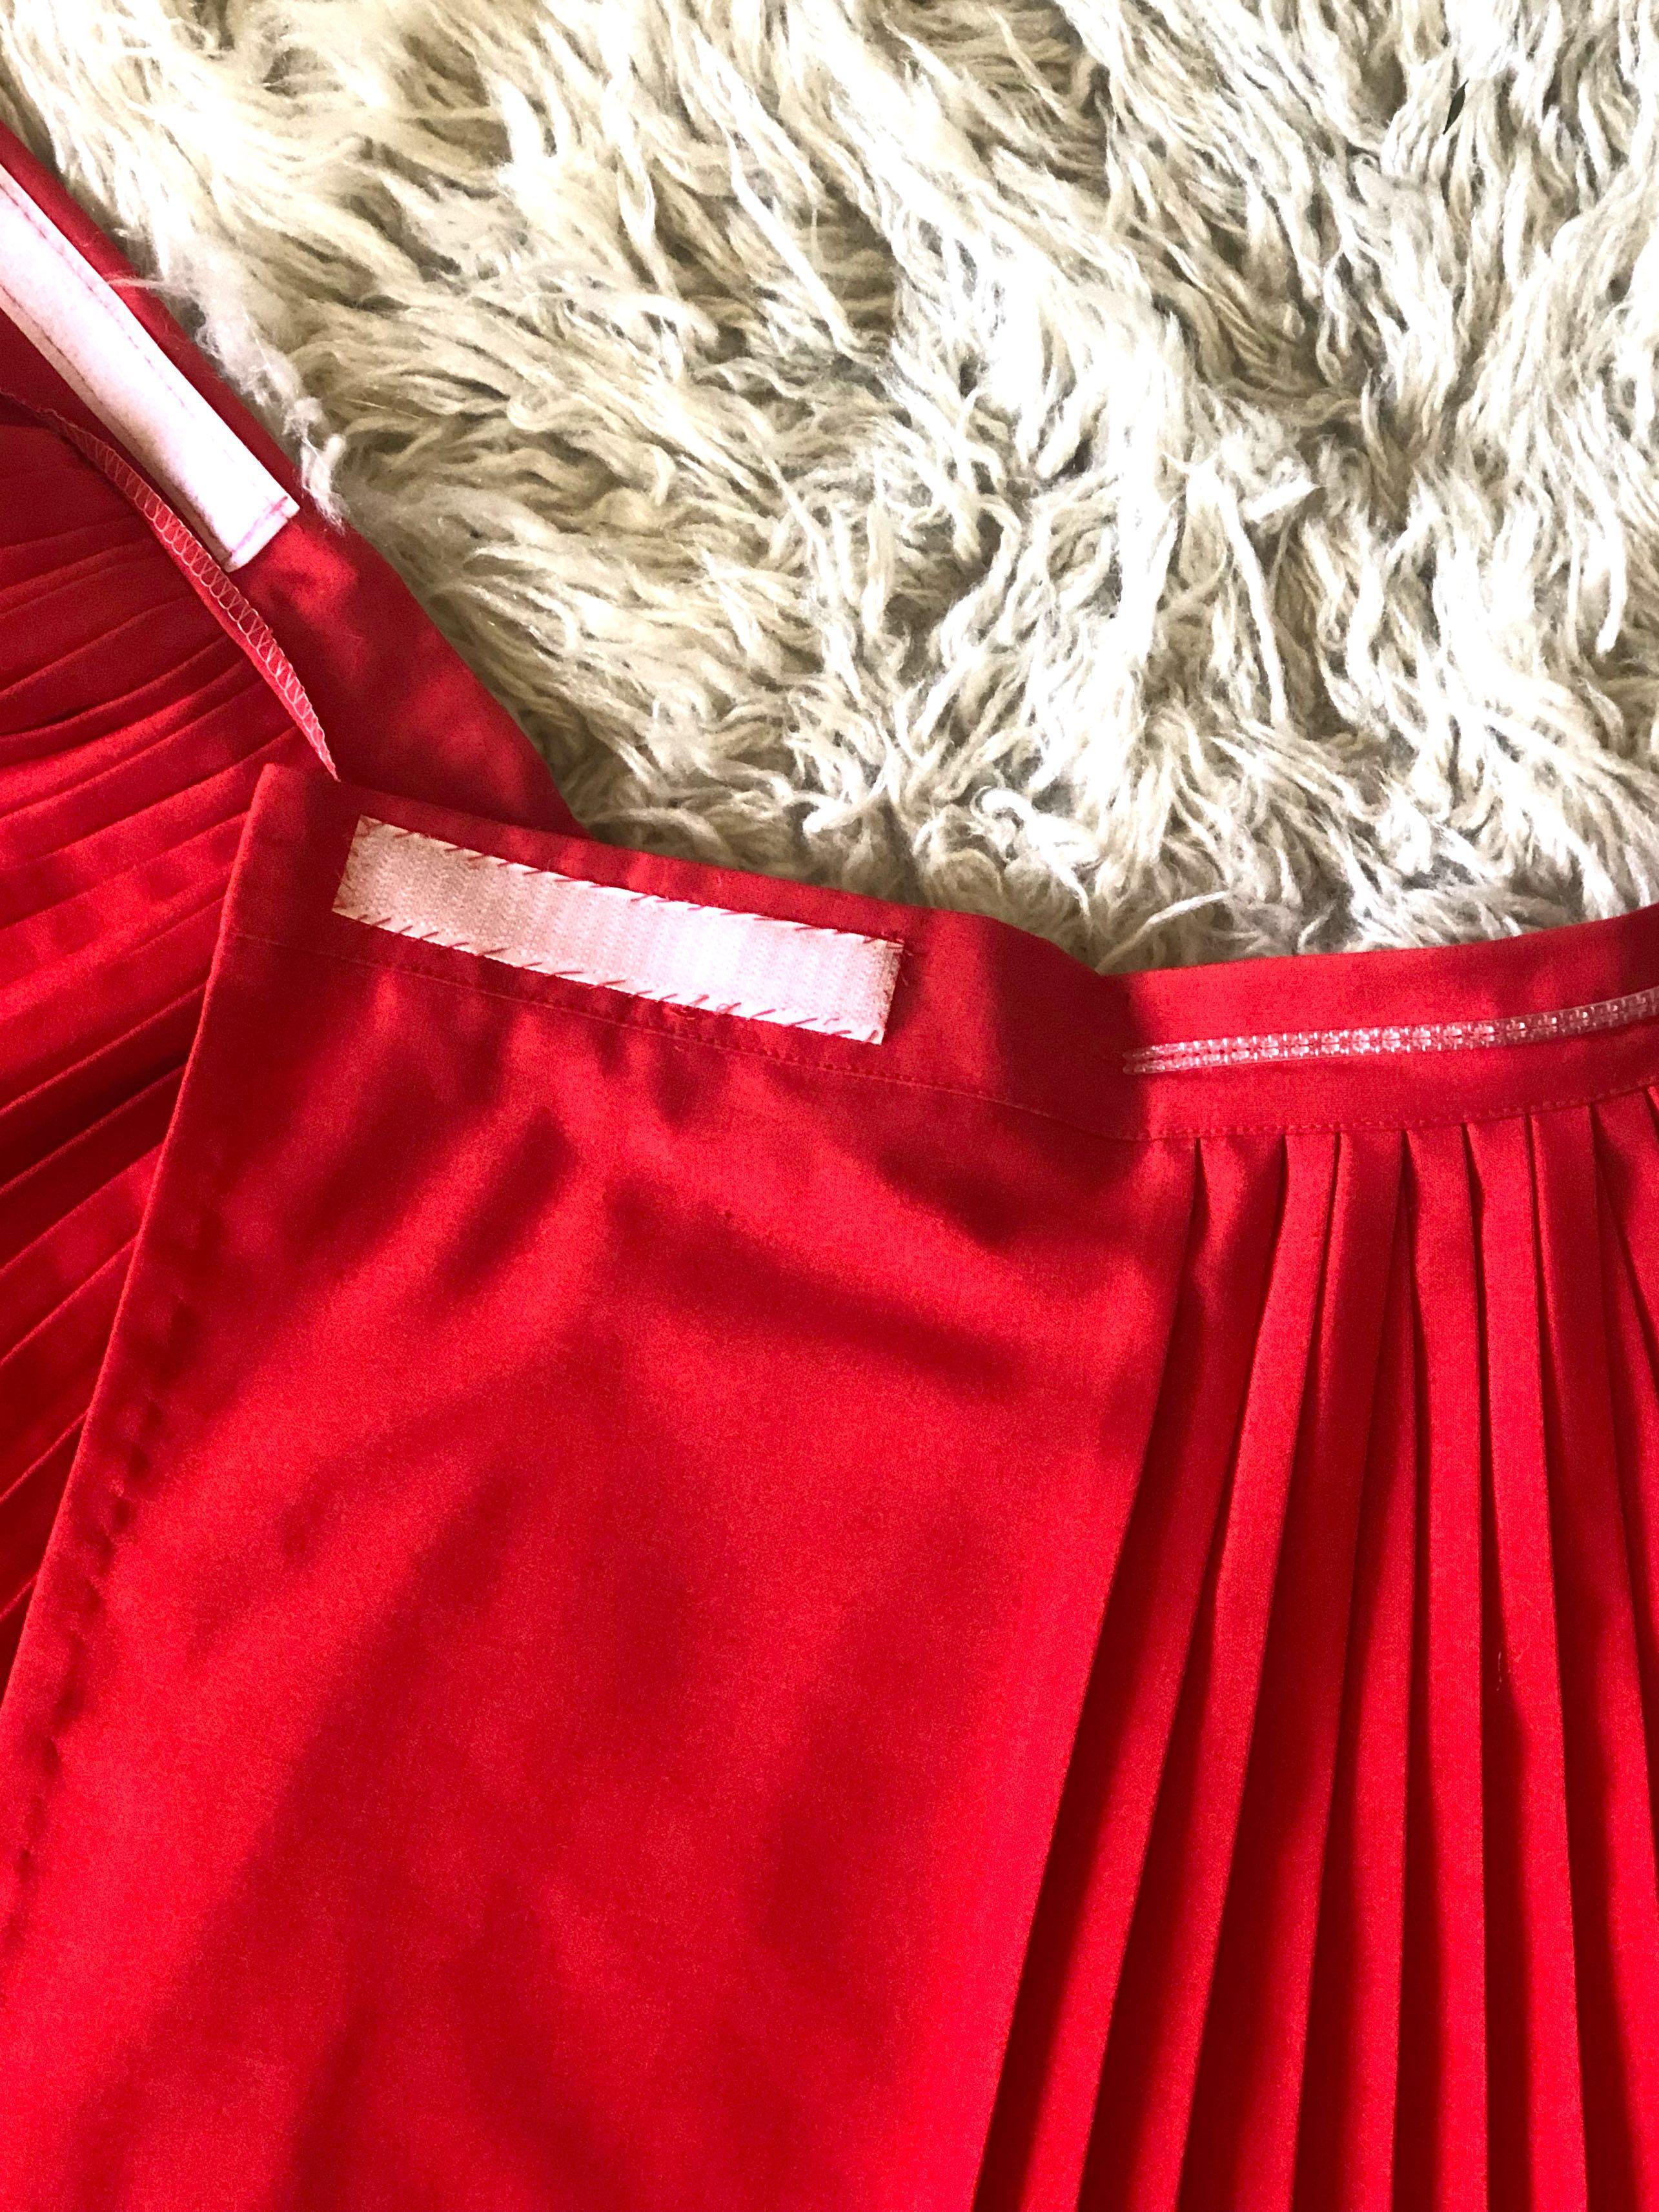 Retro tennis skirt